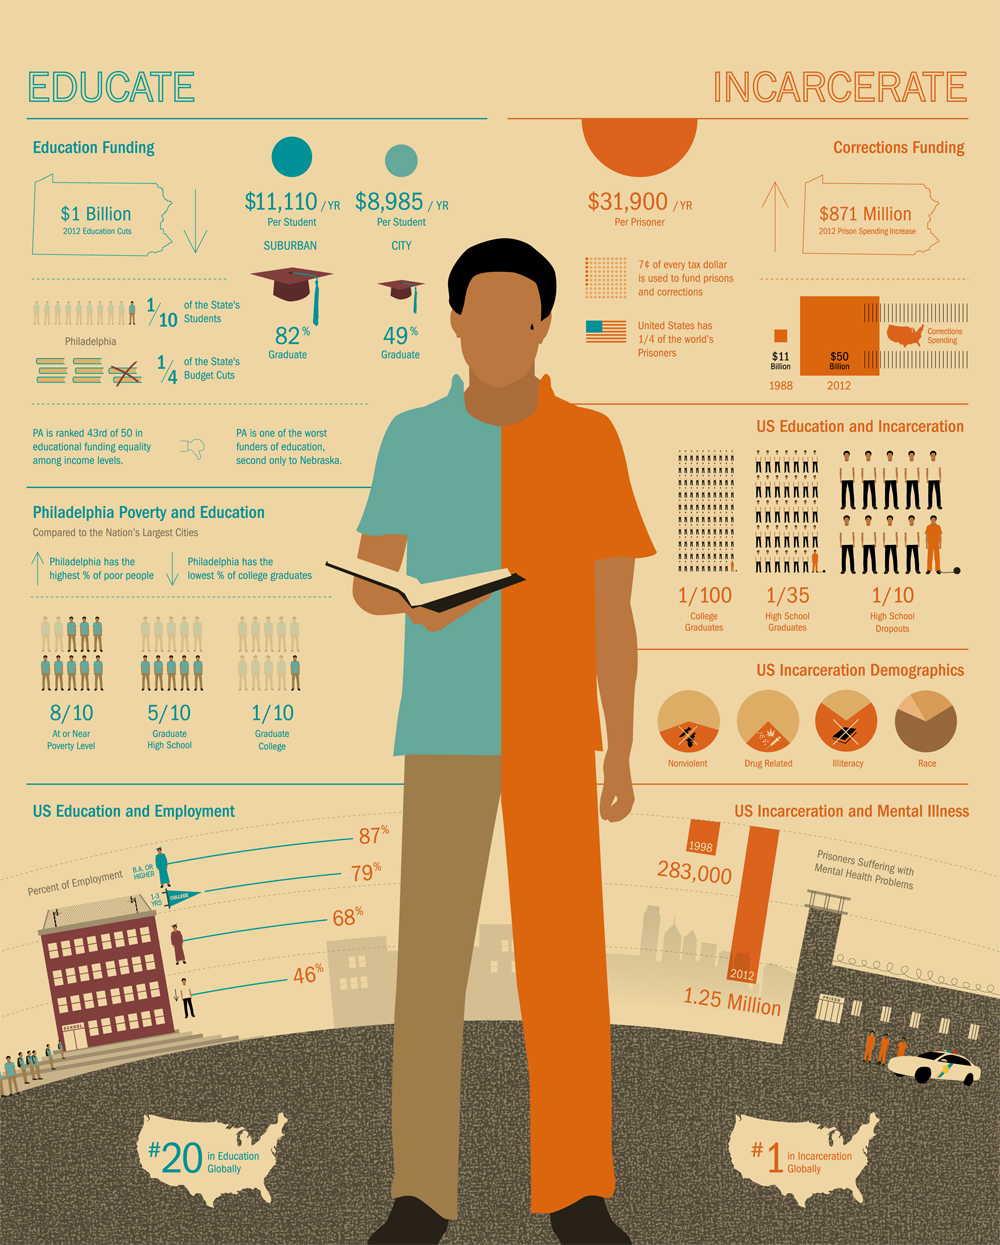 Educate/Incarcerate